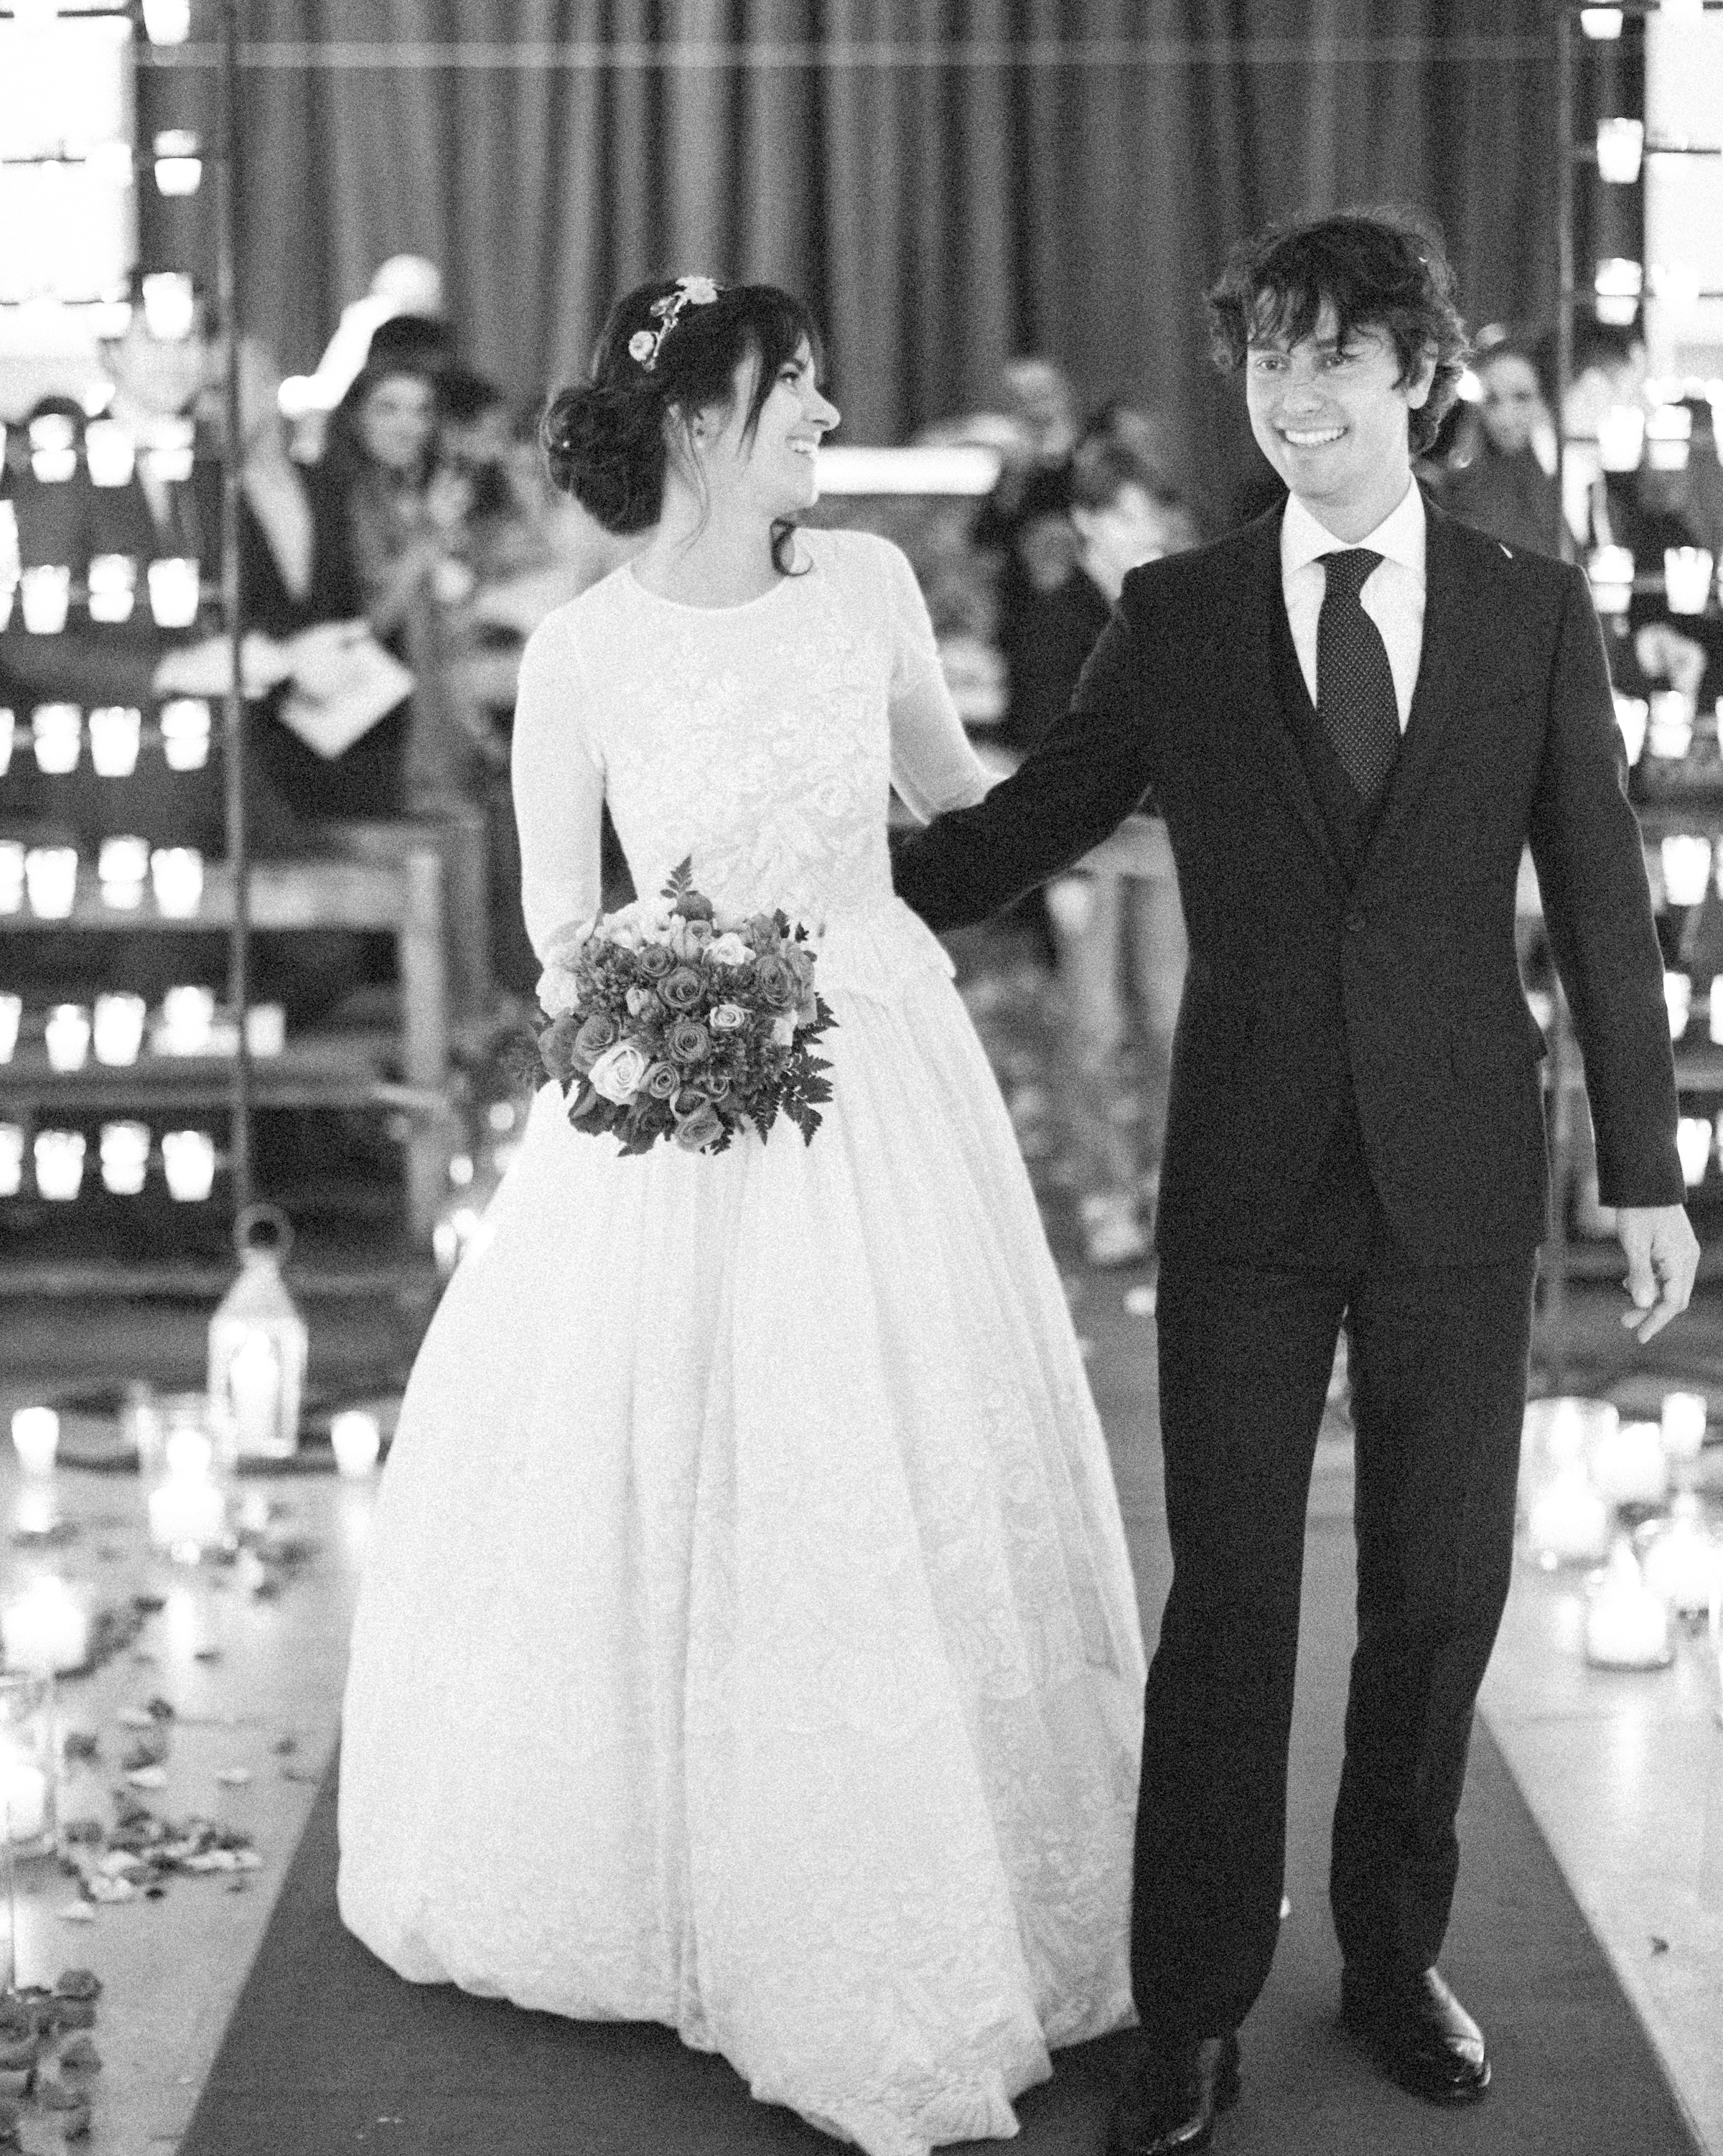 federica-tommaso-wedding-ceremony-076-s112330-1015.jpg